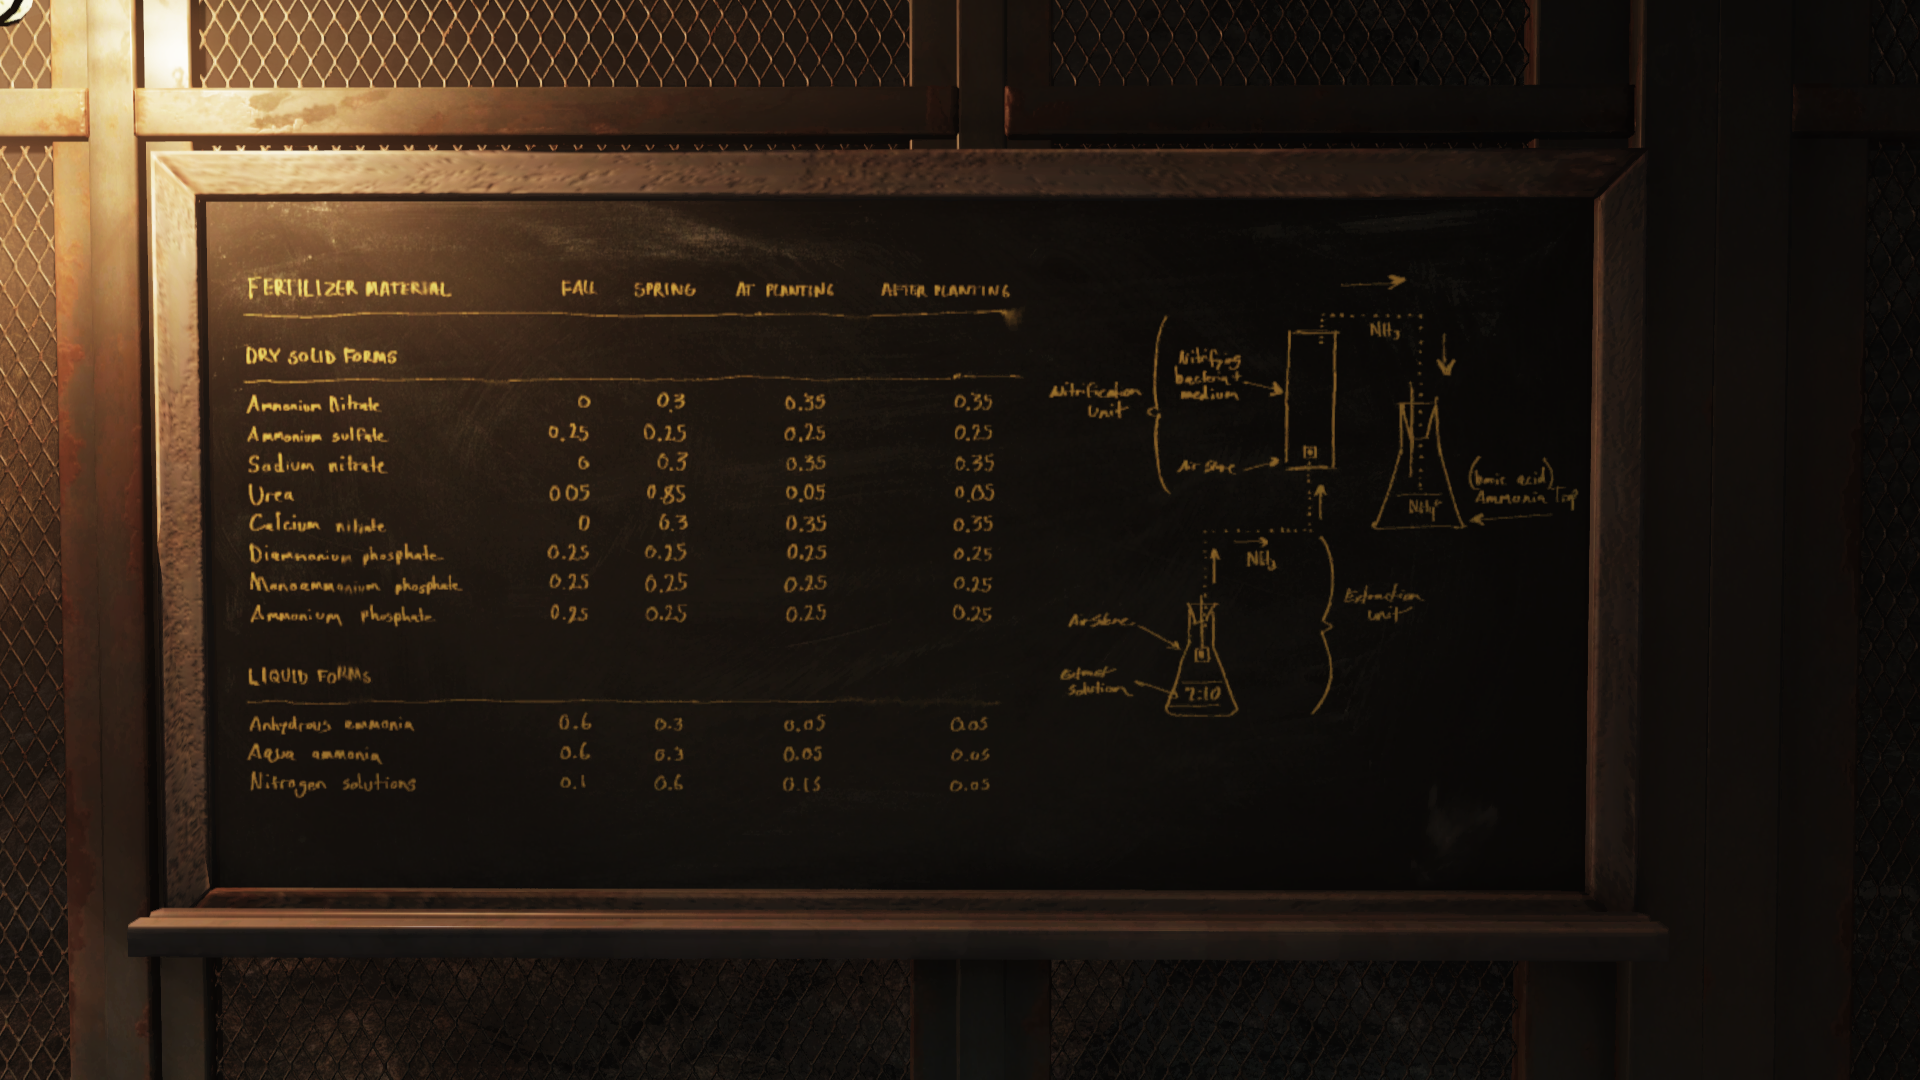 FO76WL Overseer's home board